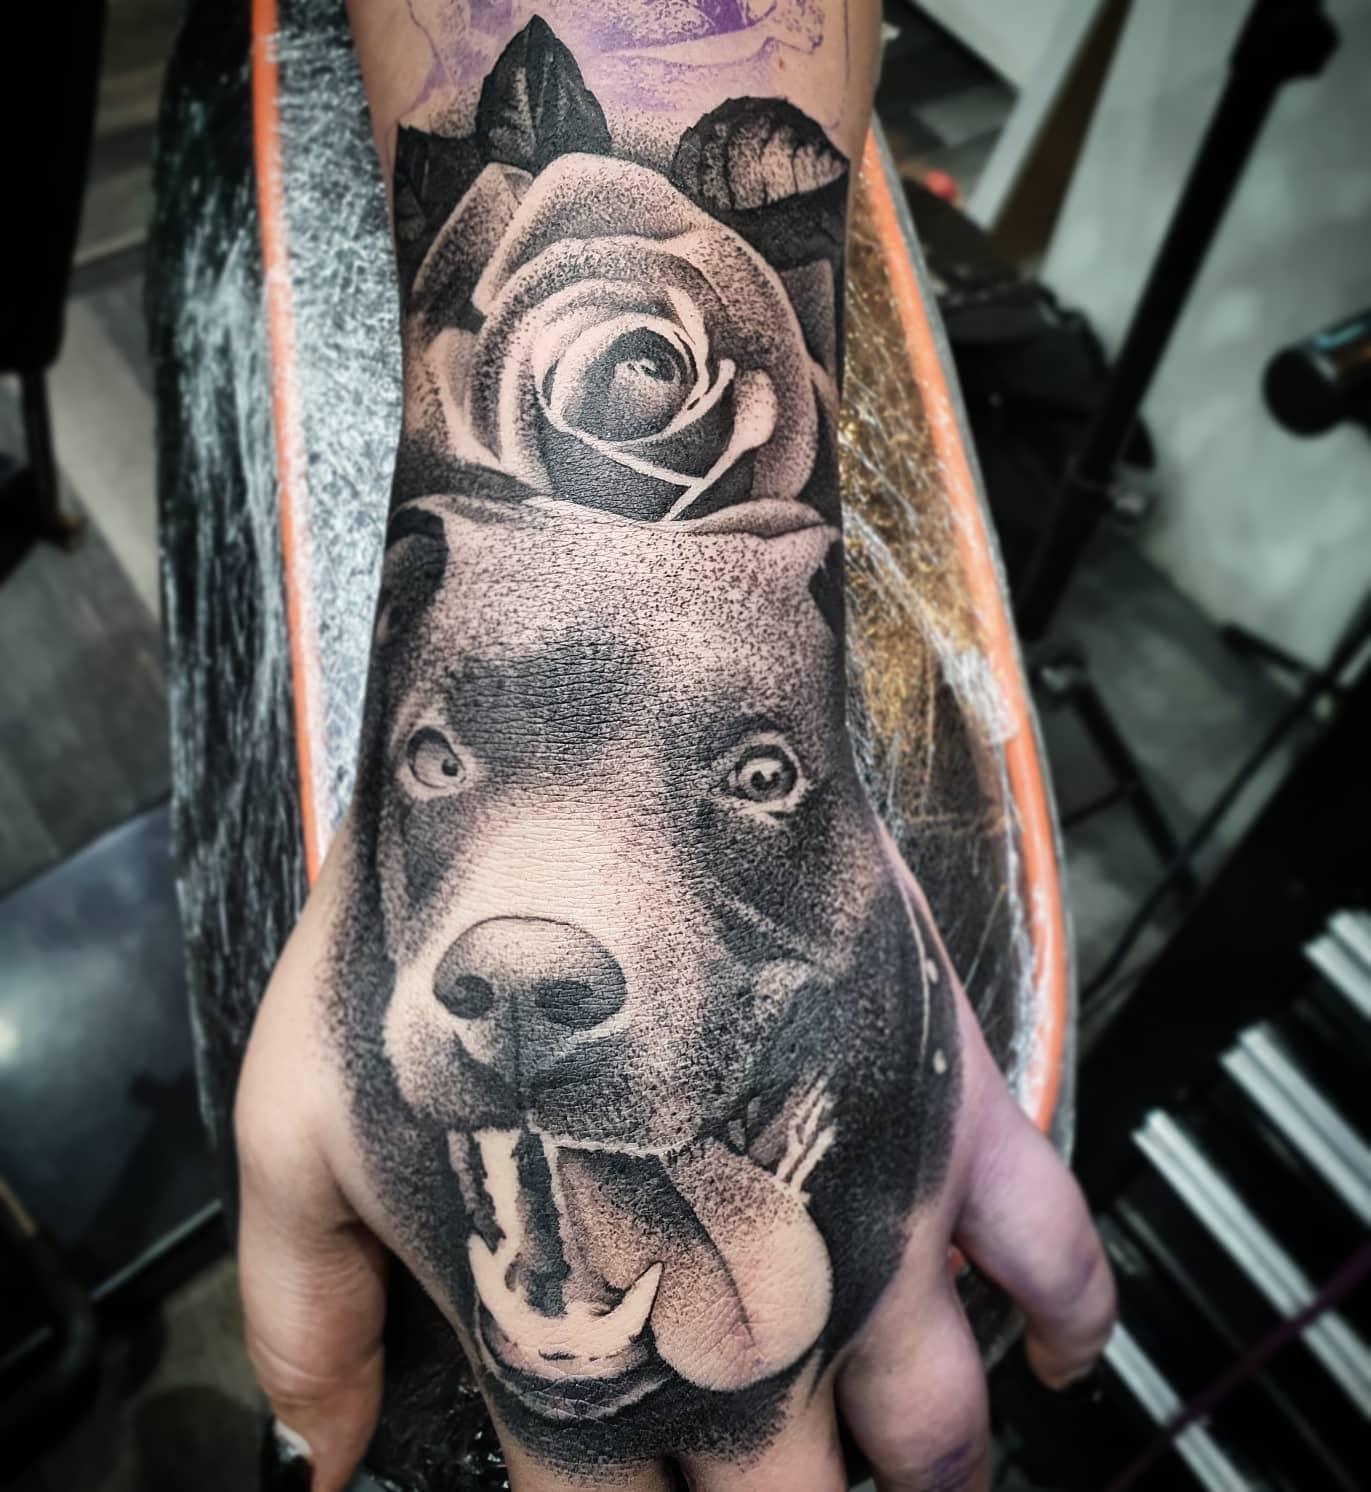 This cheeky gal  _____________________ tattoo dogtattoo dogportrait pet artdriven stencilstuff edinburghtattooartist studioxiii silverbackink btattooing onlythedarkest tattooartist tattooartistuk edinburgh ink tattoos inked tattooed picoftheday art love pic photooftheday photo blackandgrey blackngrey instagram artist design tattooer